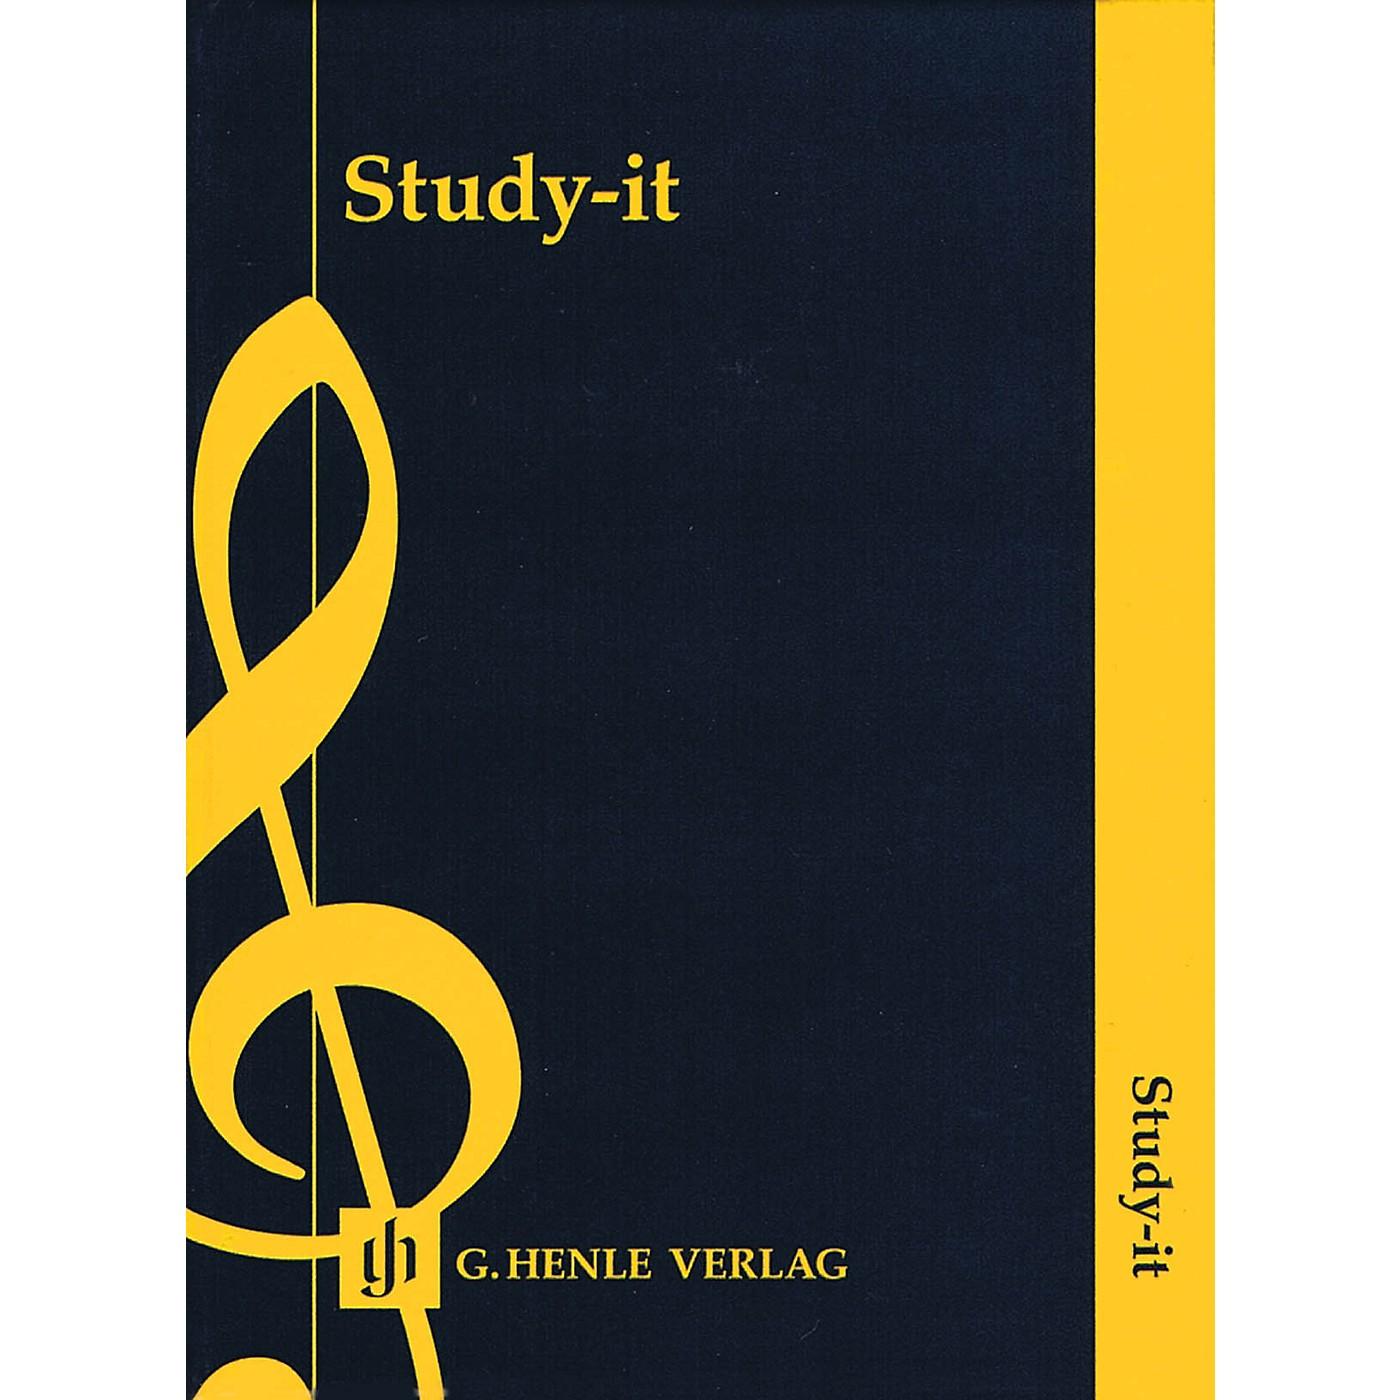 G. Henle Verlag Study-it Sticky Notes Henle Music Folios Series Hardcover thumbnail